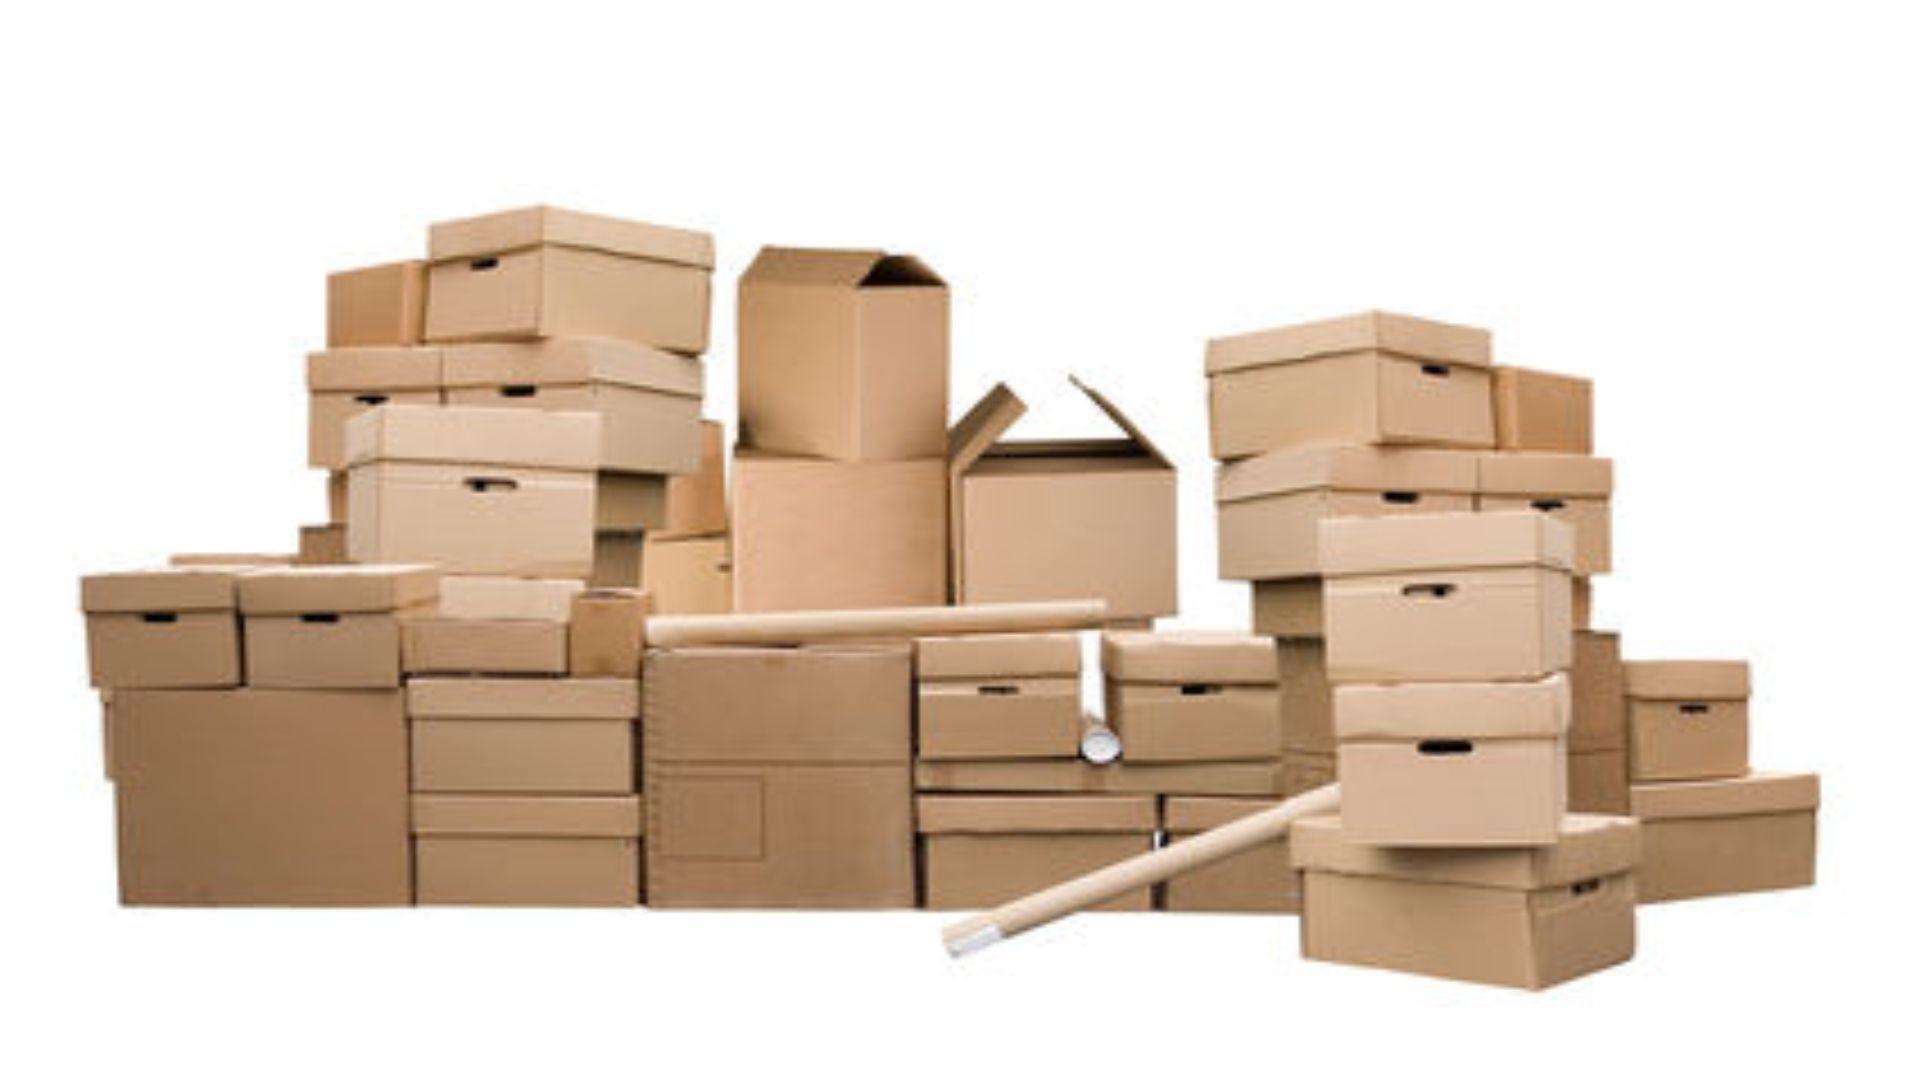 Fabricante de cajas de cartón